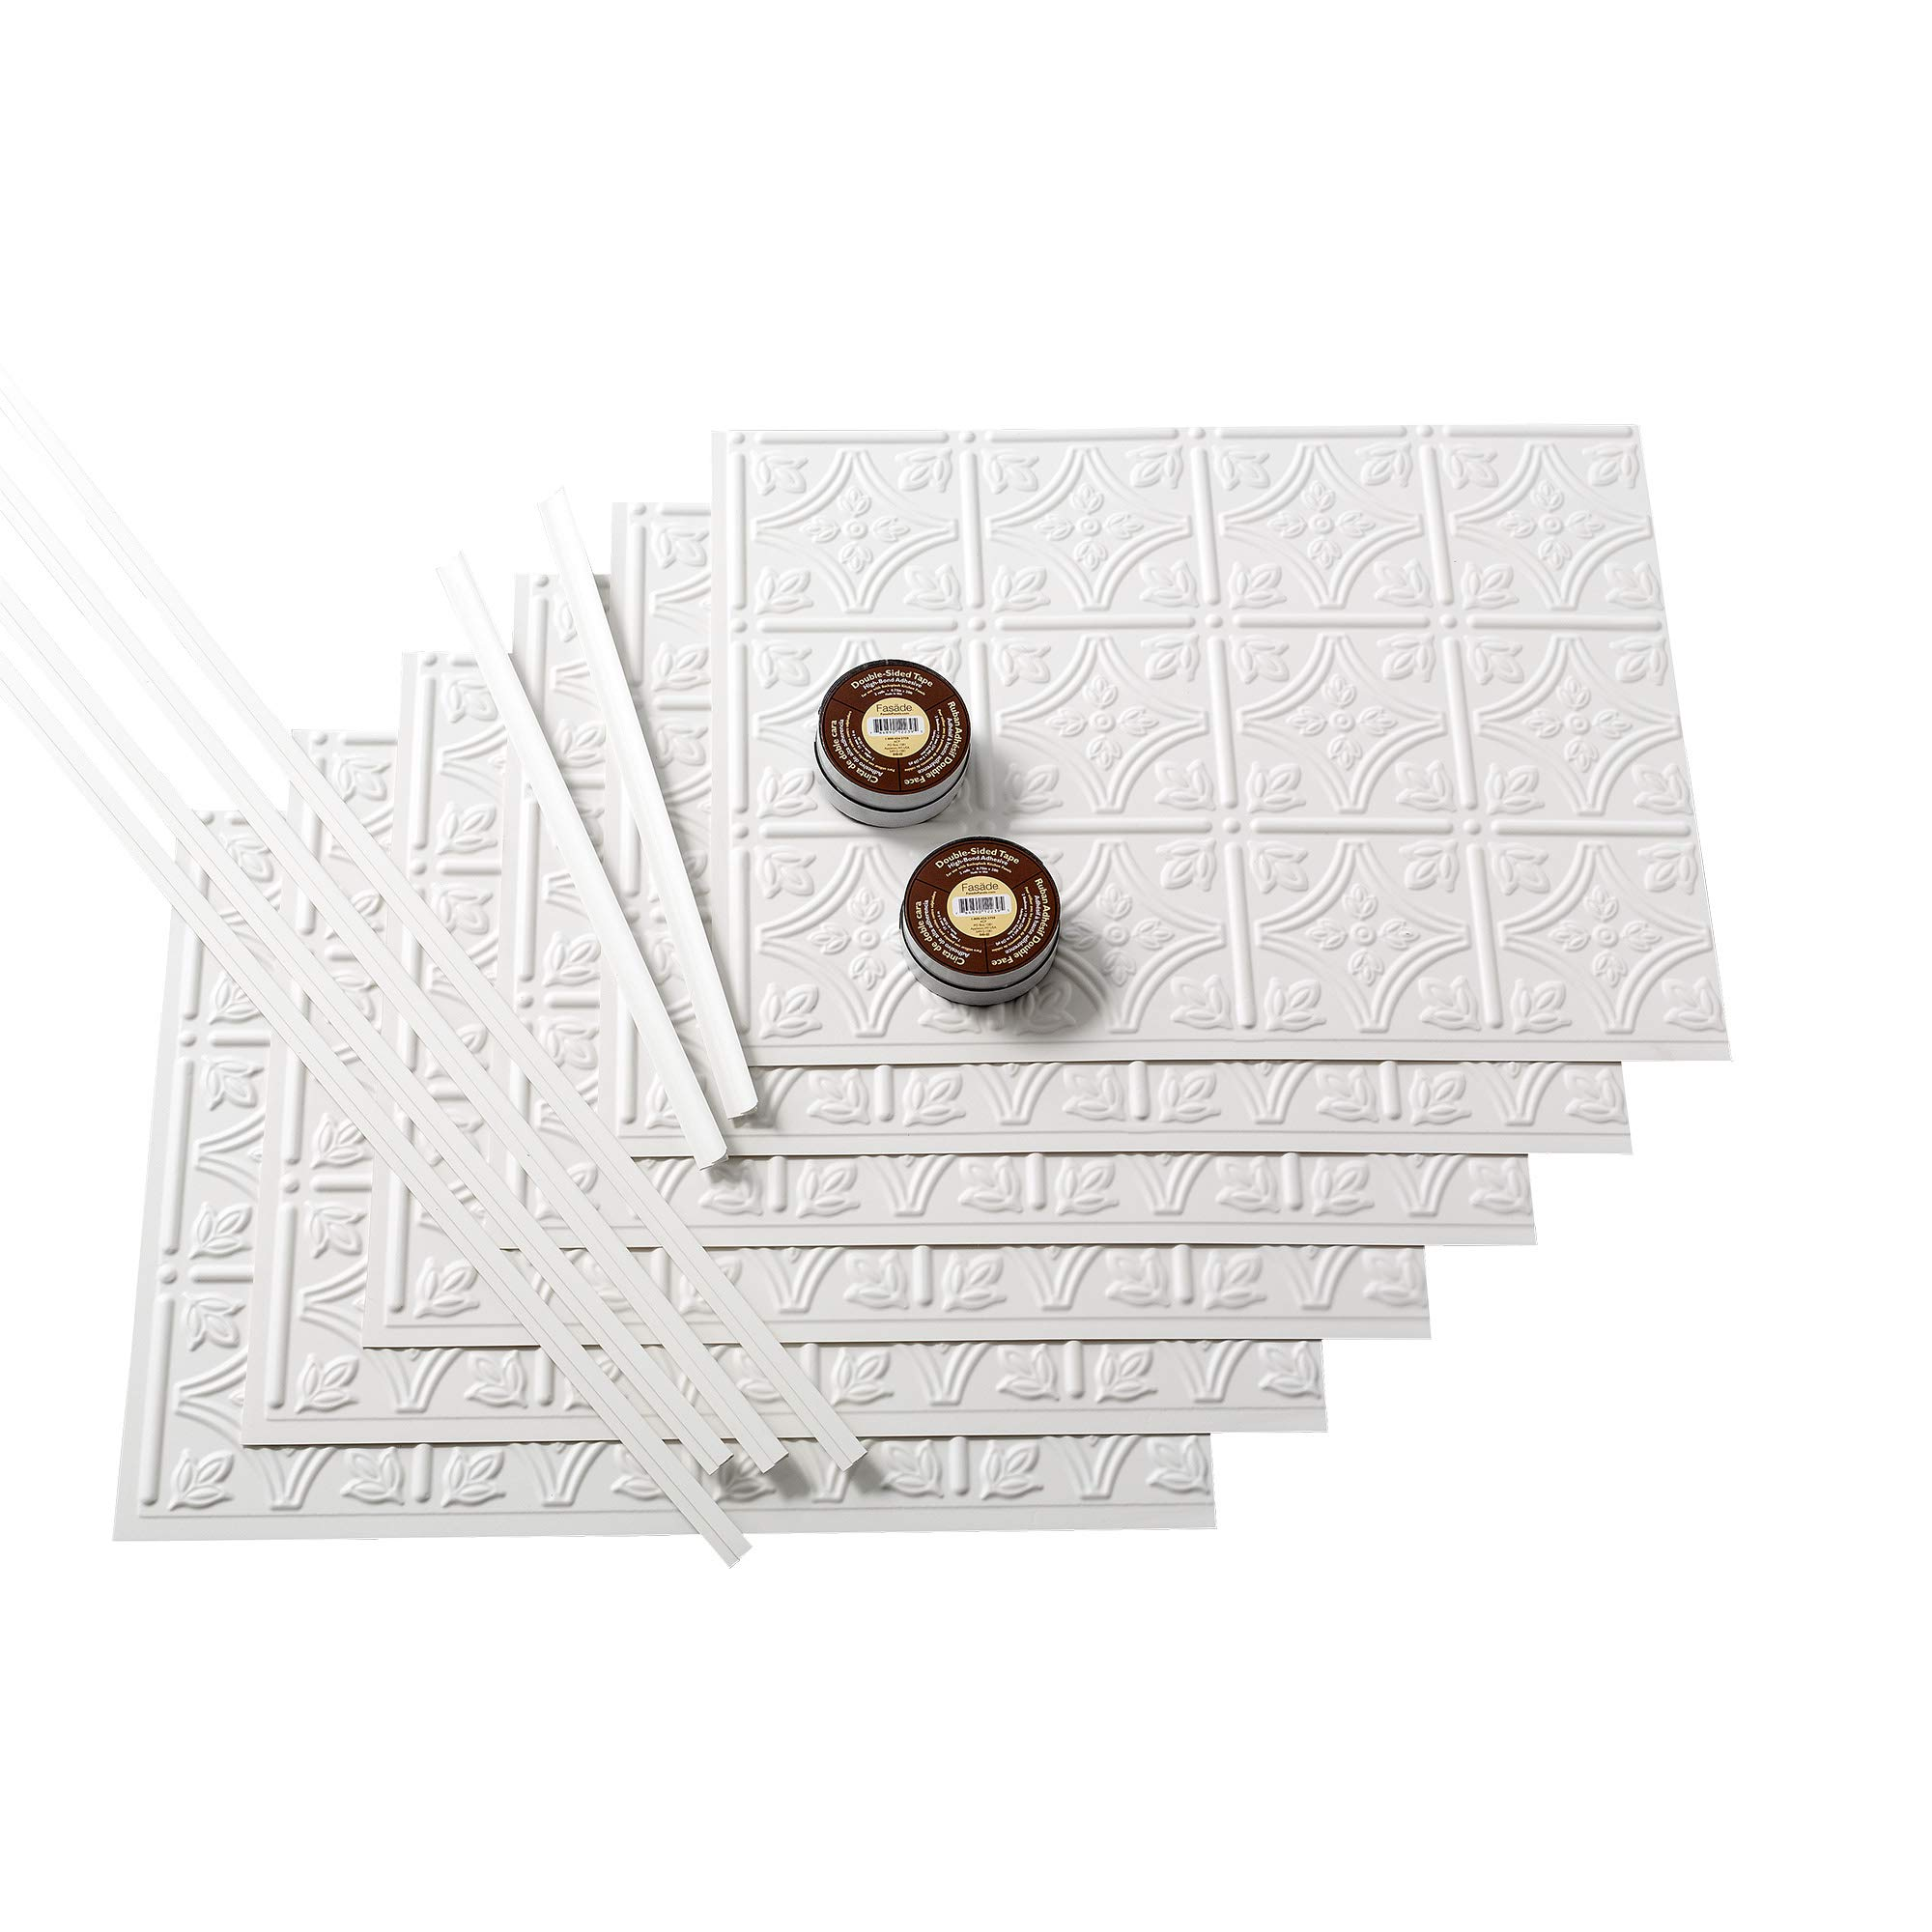 FASÄDE Easy Installation Traditional 1 Matte White Backsplash Panel for Kitchen and Bathrooms (18 sq ft Kit)